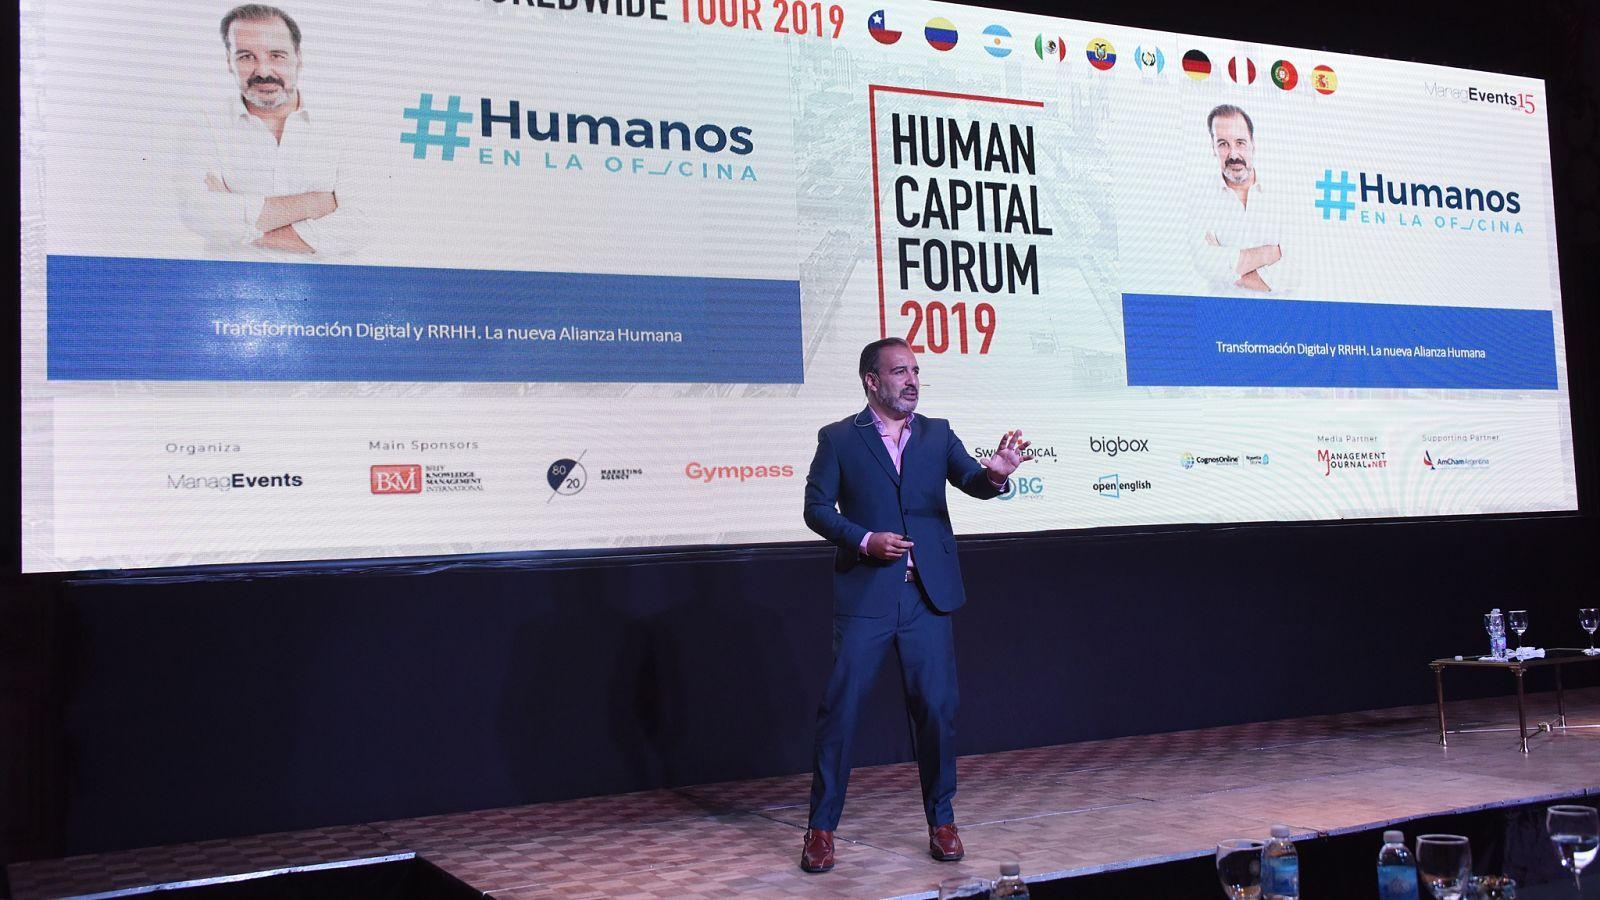 Miguel Angel Perez Laguna Keynote Speaker Motivacional Liderazgo RRHH Digitales_opt